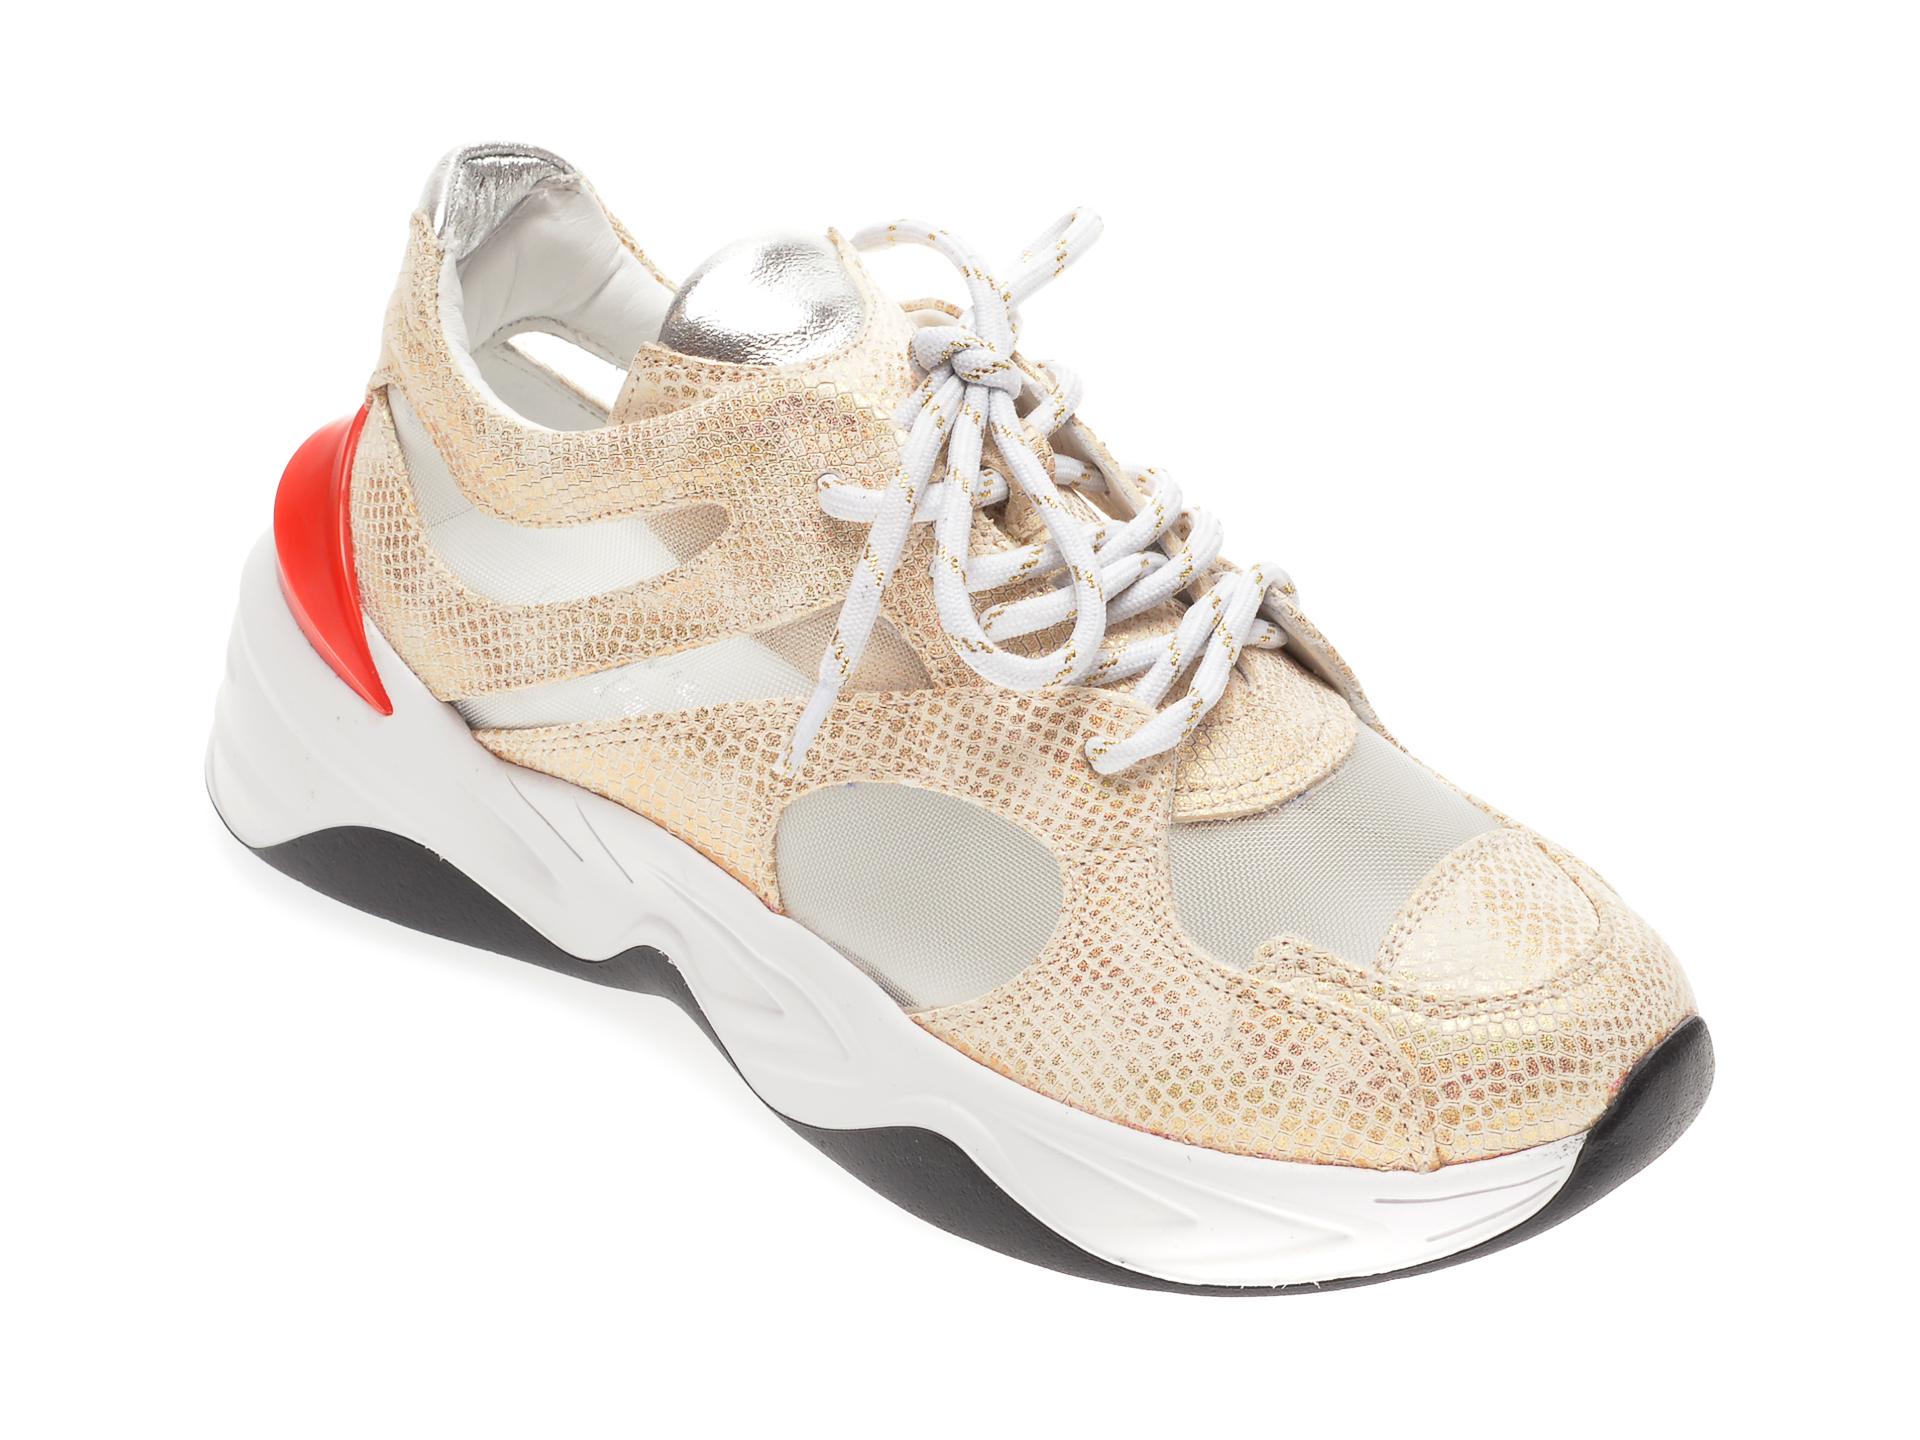 Pantofi Sport Flavia Passini Aurii, 135p17, Din Material Textil Si Piele Naturala